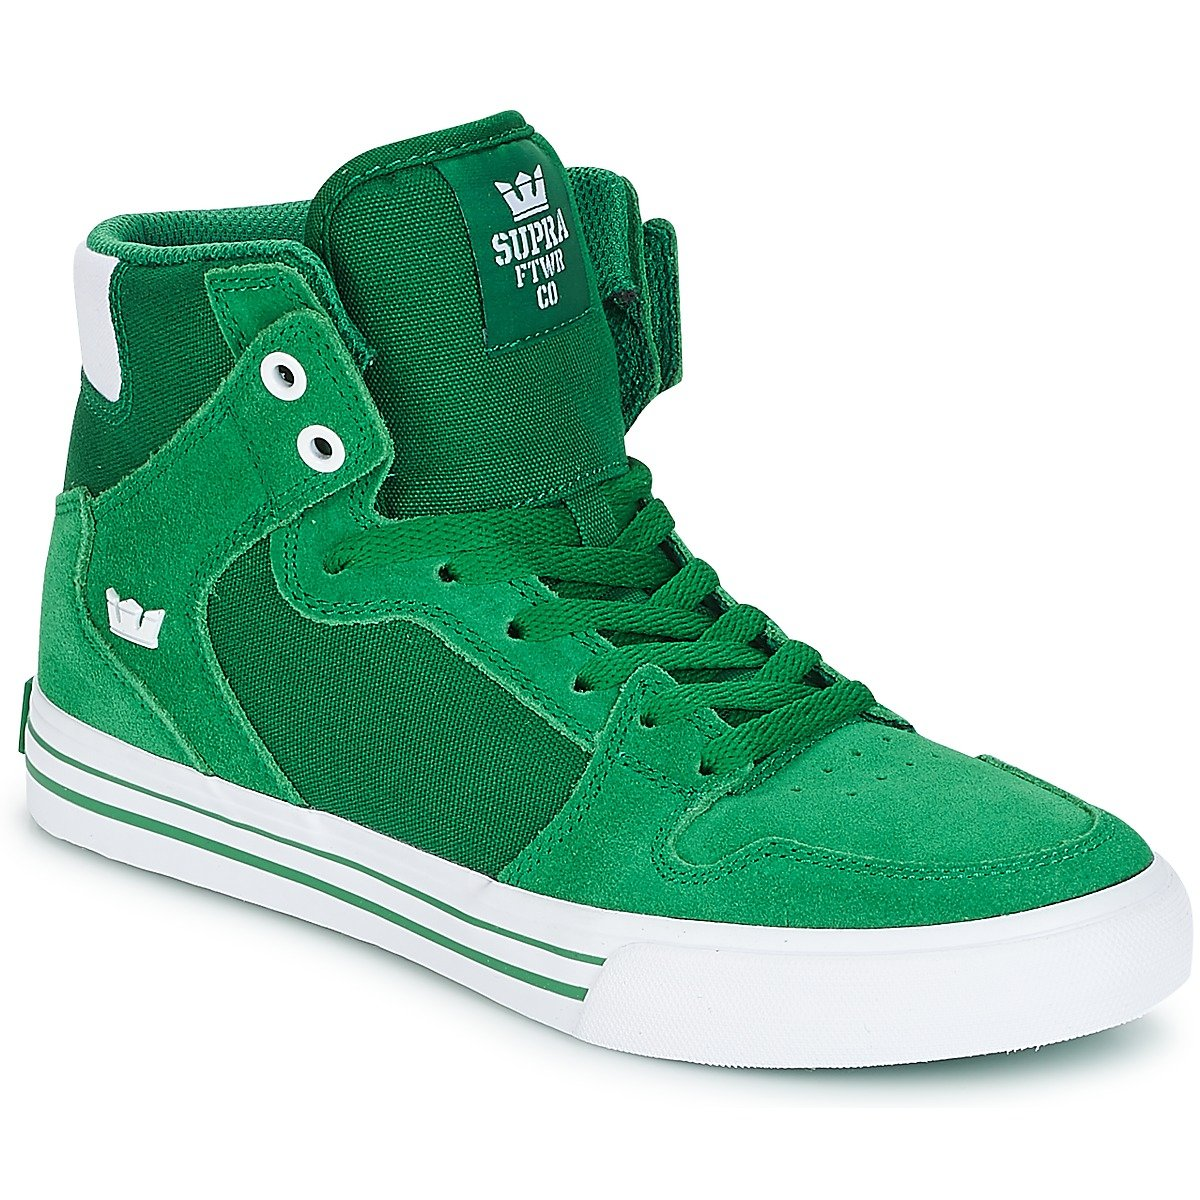 Supra Vaider LC Sneaker B074KKXW8Q 16 M US|Green/White